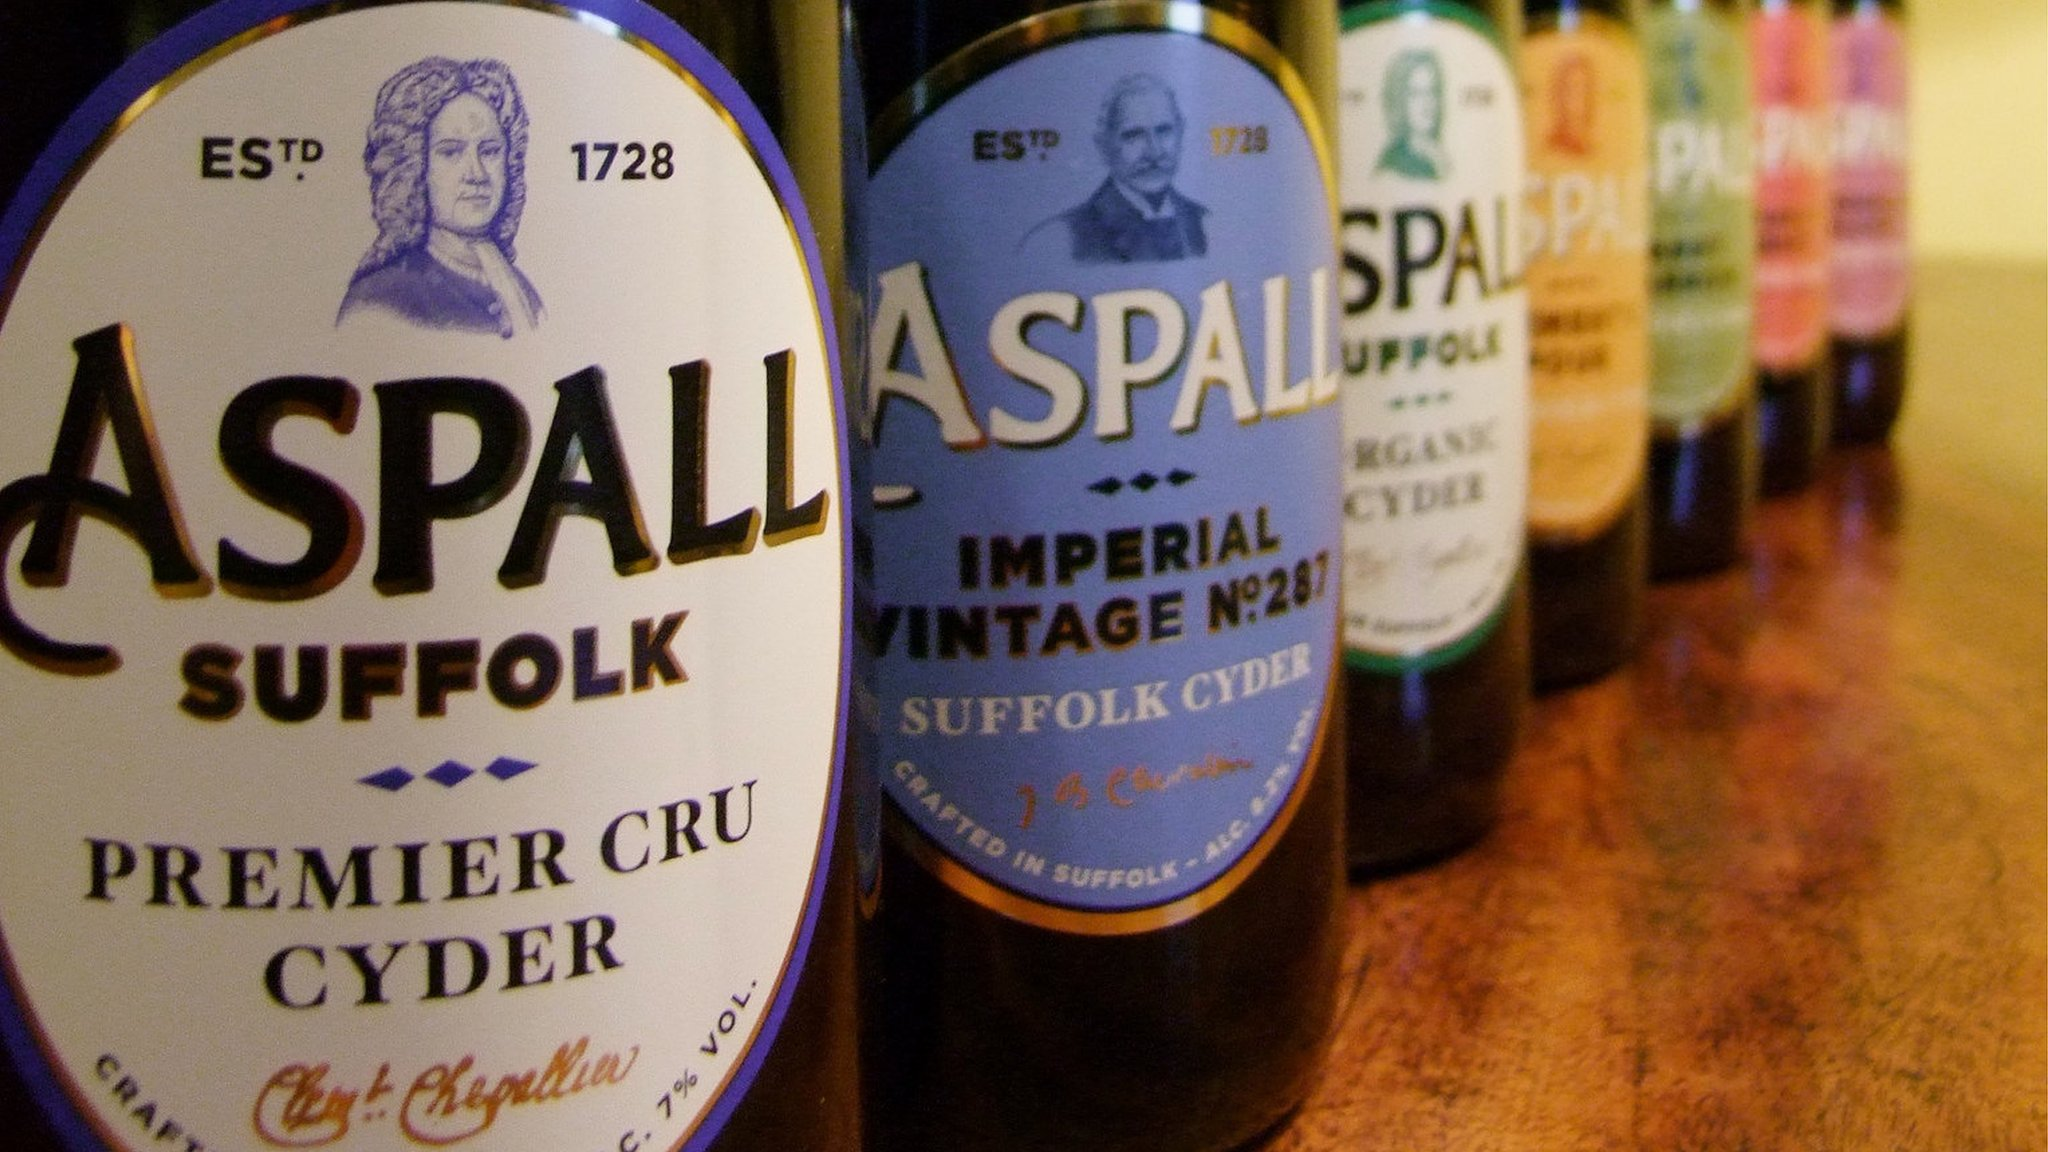 Aspall buyer's pledge £10m to boost Suffolk cider plant